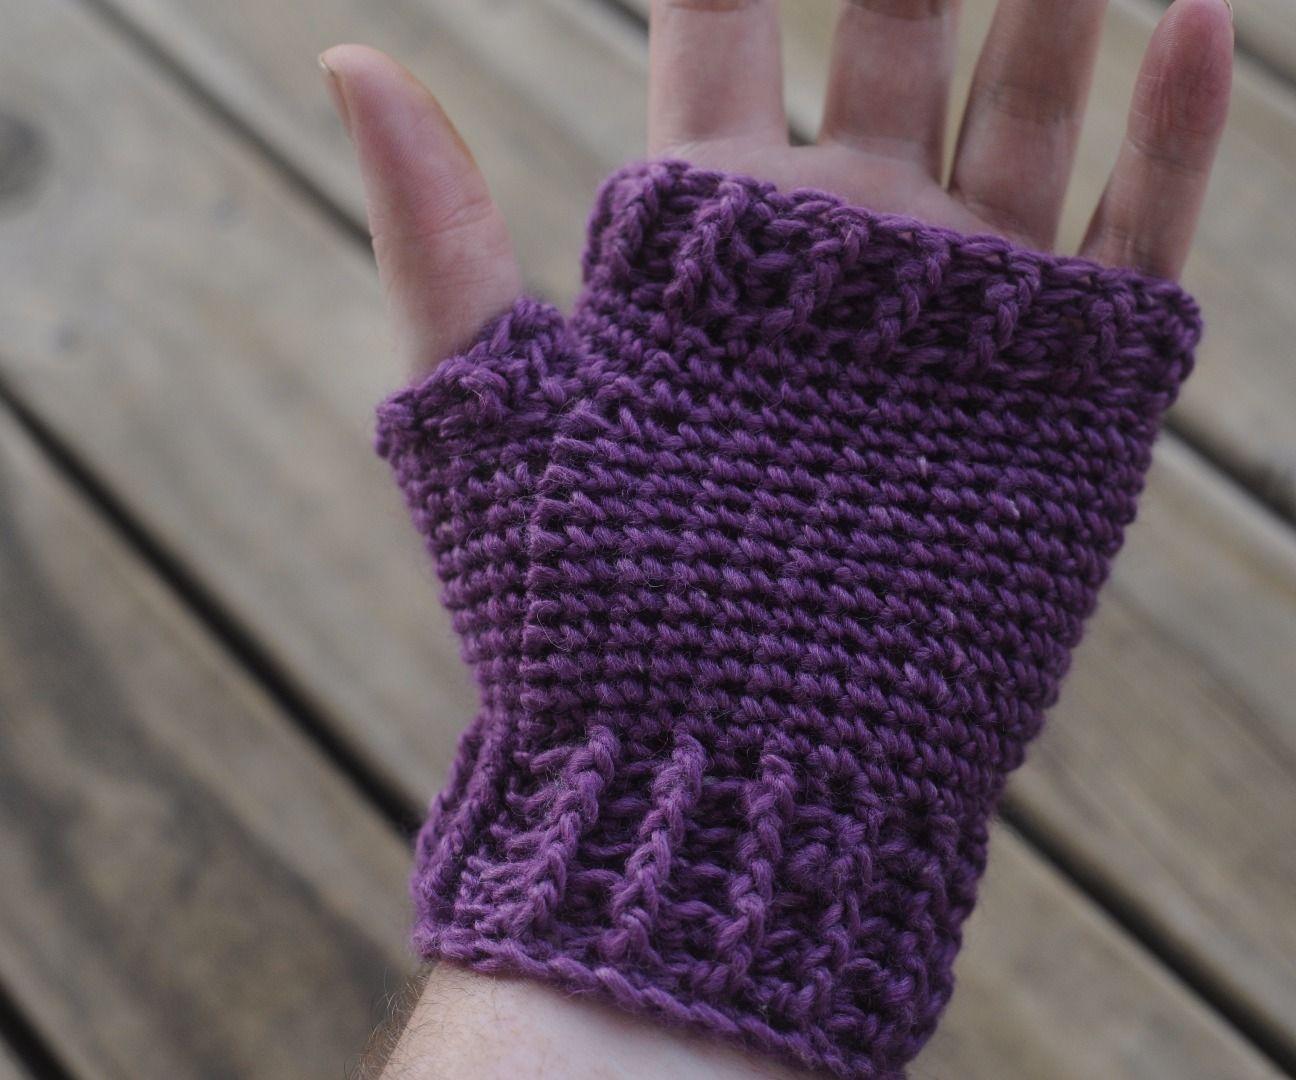 How to Crochet Adult Fingerless Mitts / Gloves